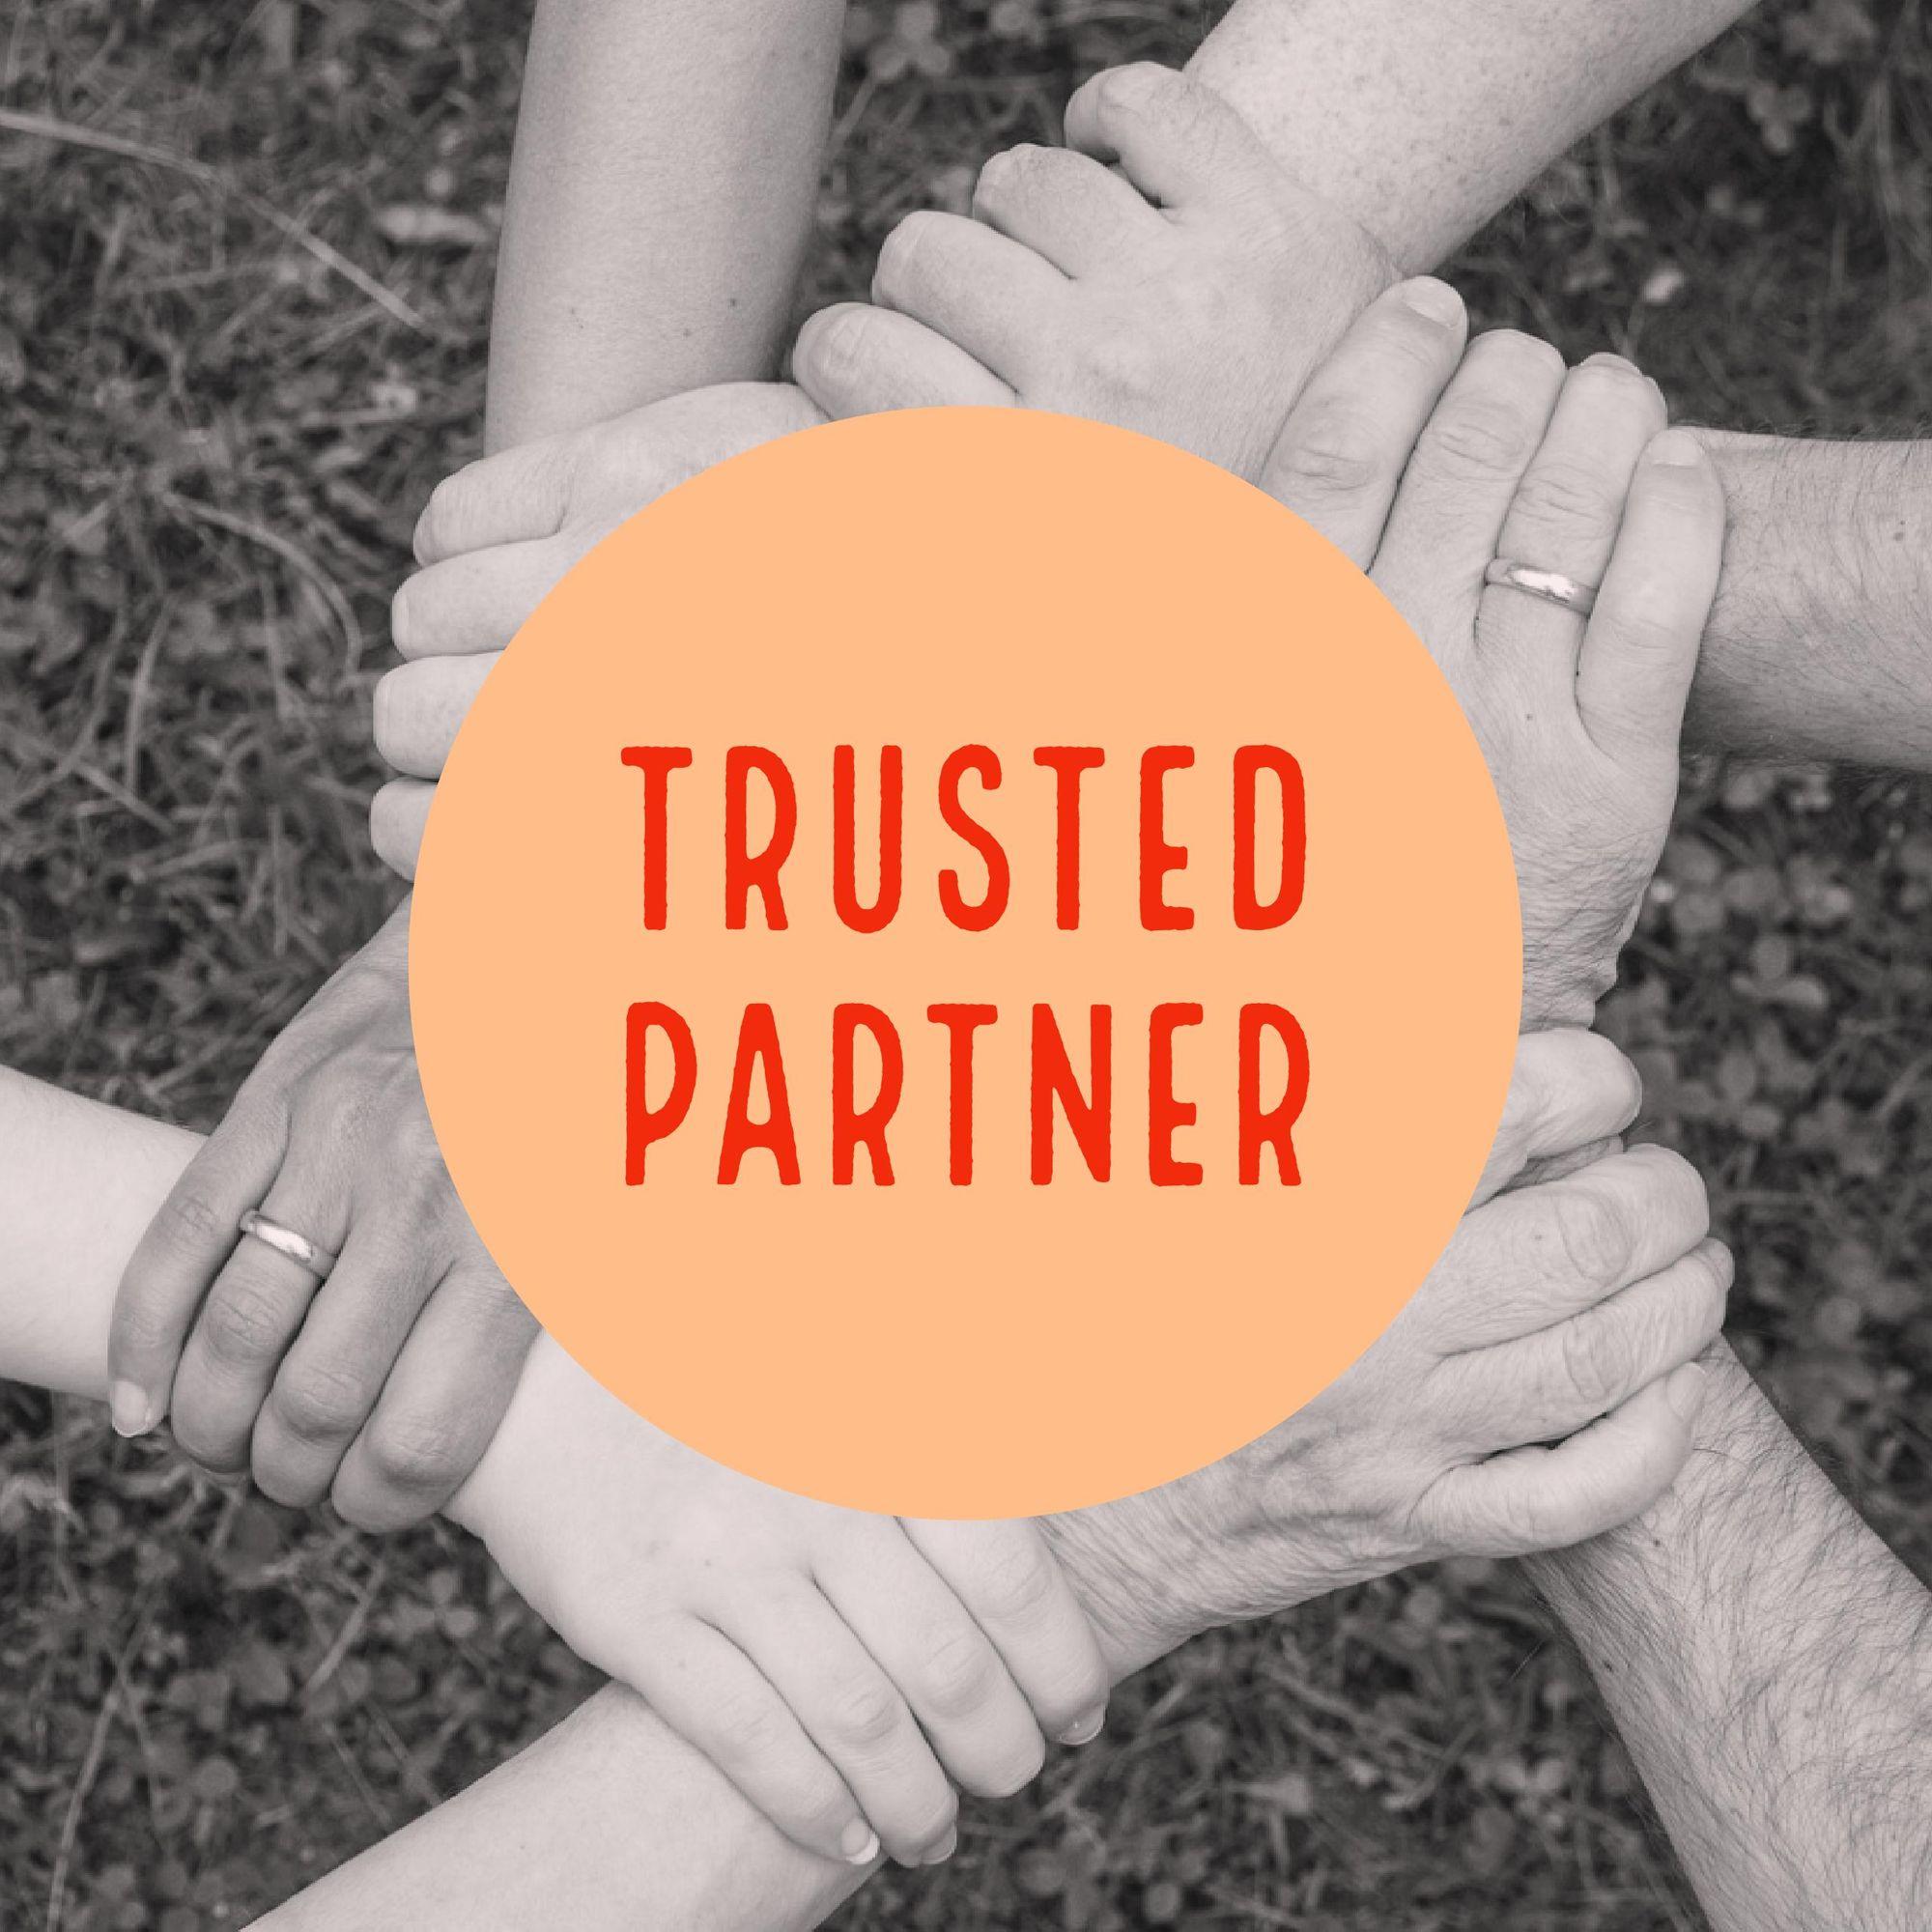 JOTA-JOTI Trusted Partner 2017